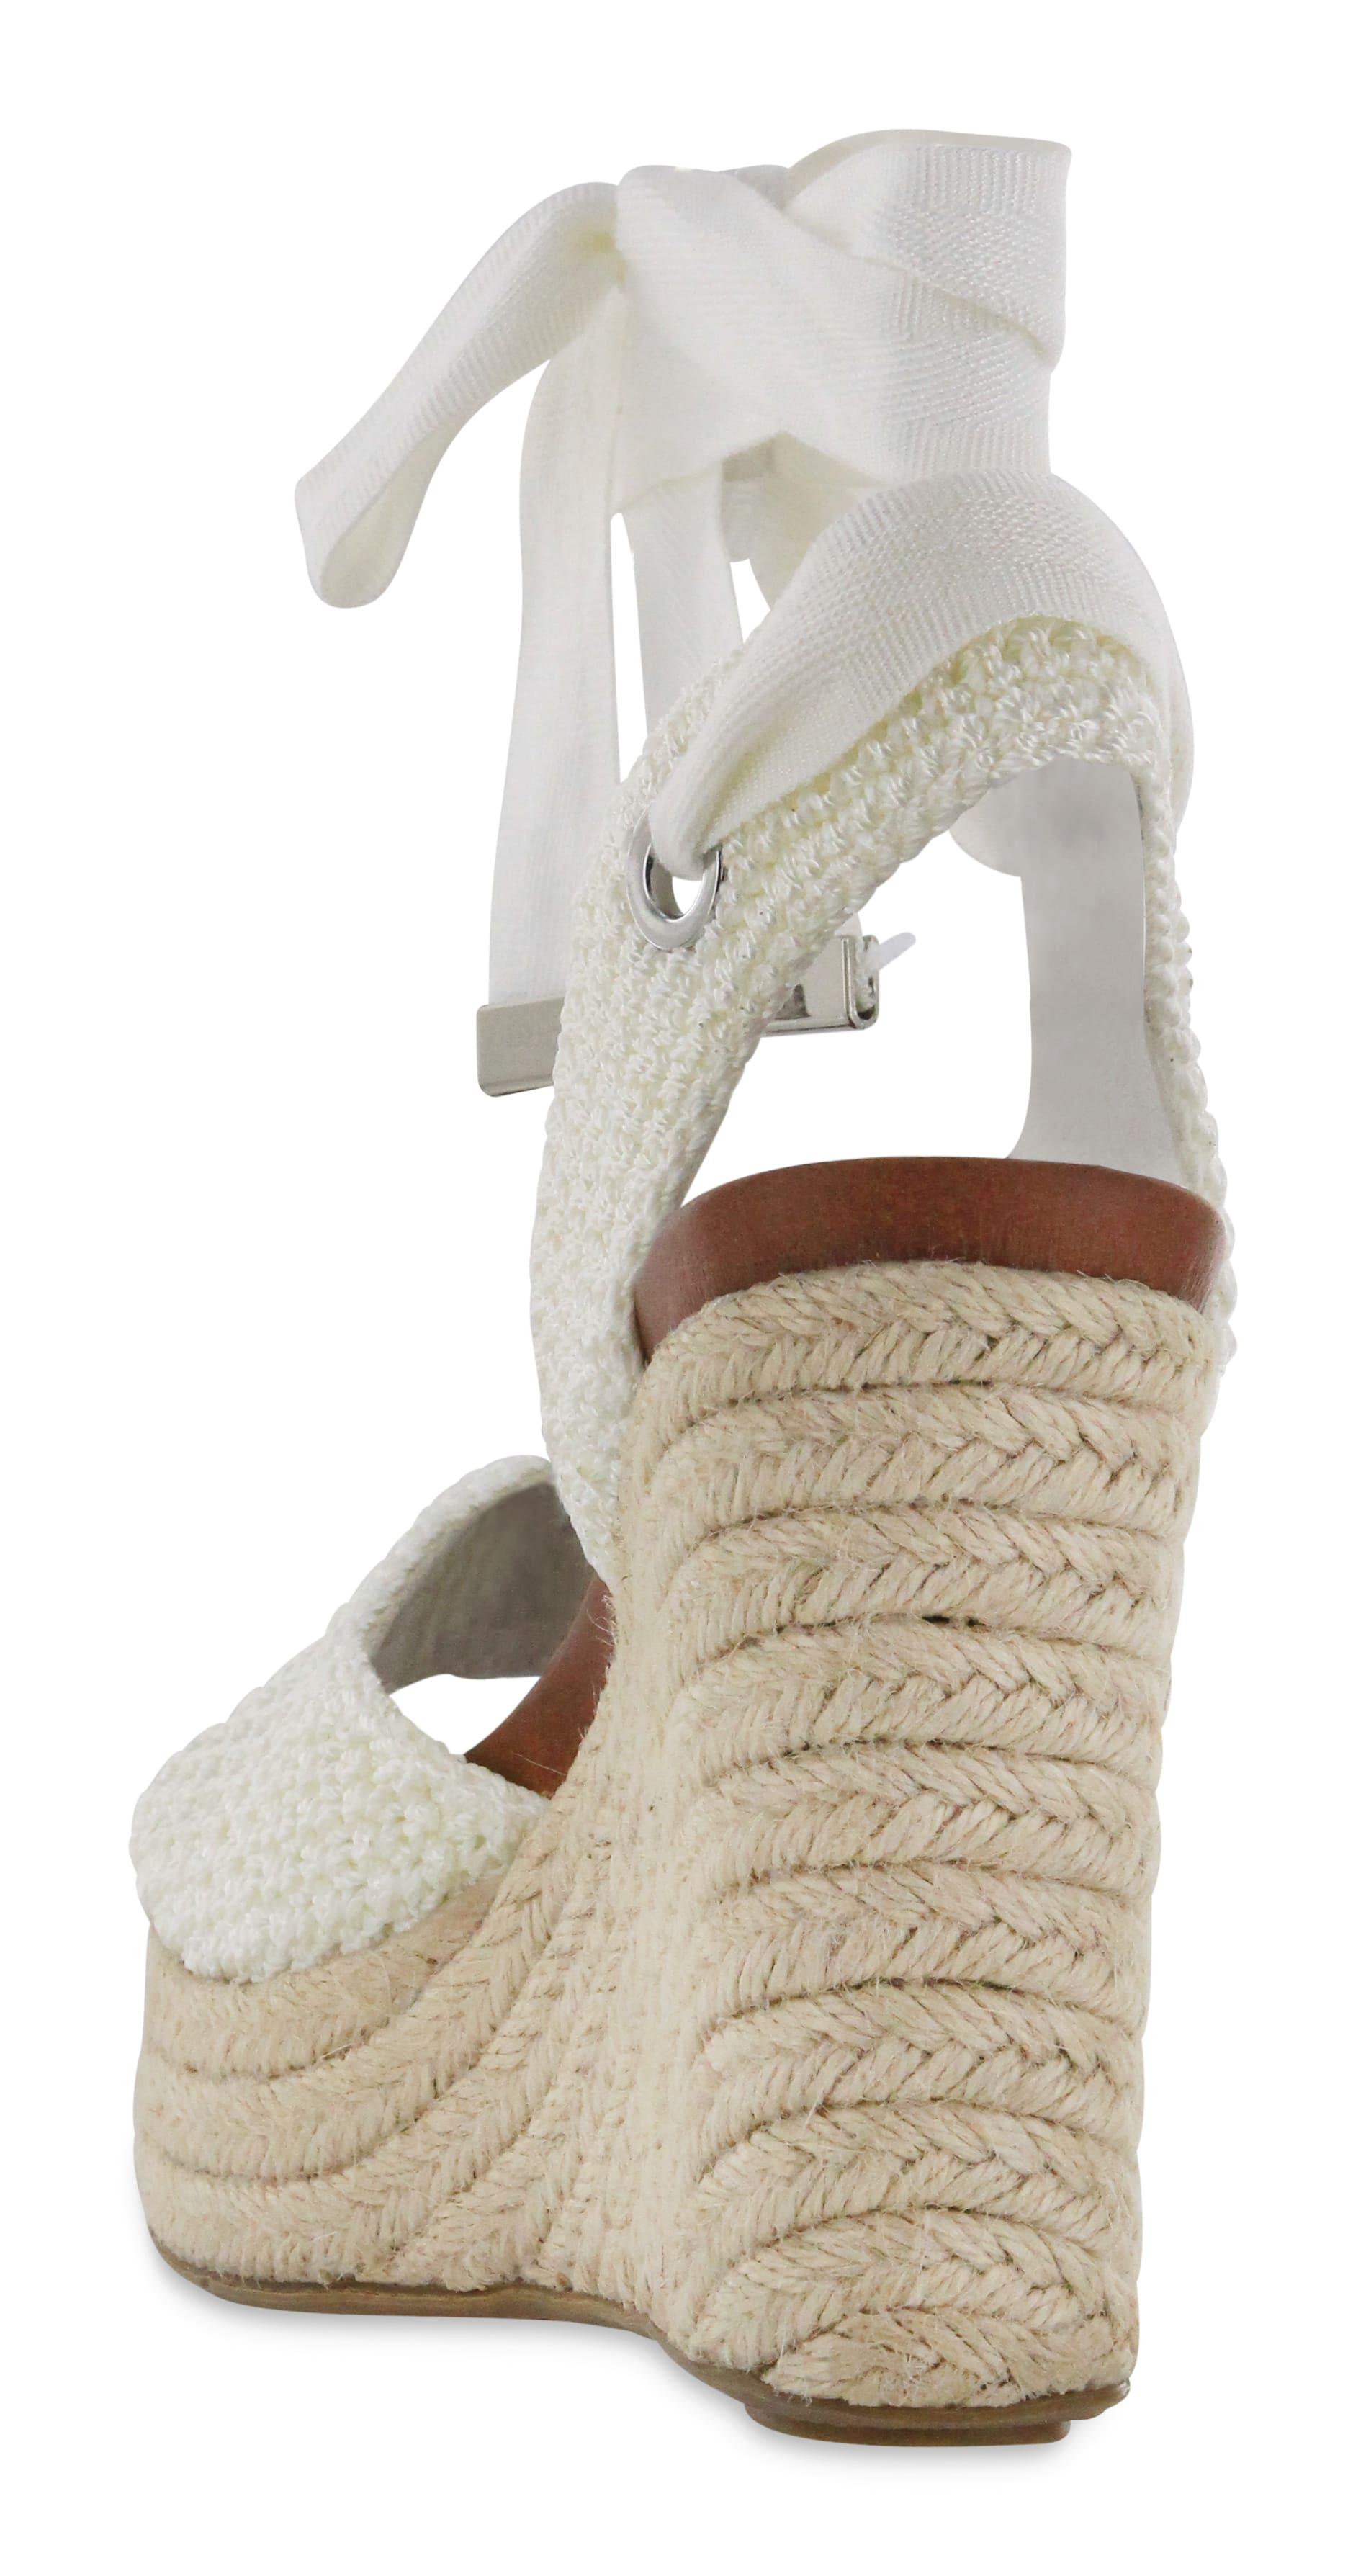 Mia Yanet Espadrille Wedge Sandal - white - Detail